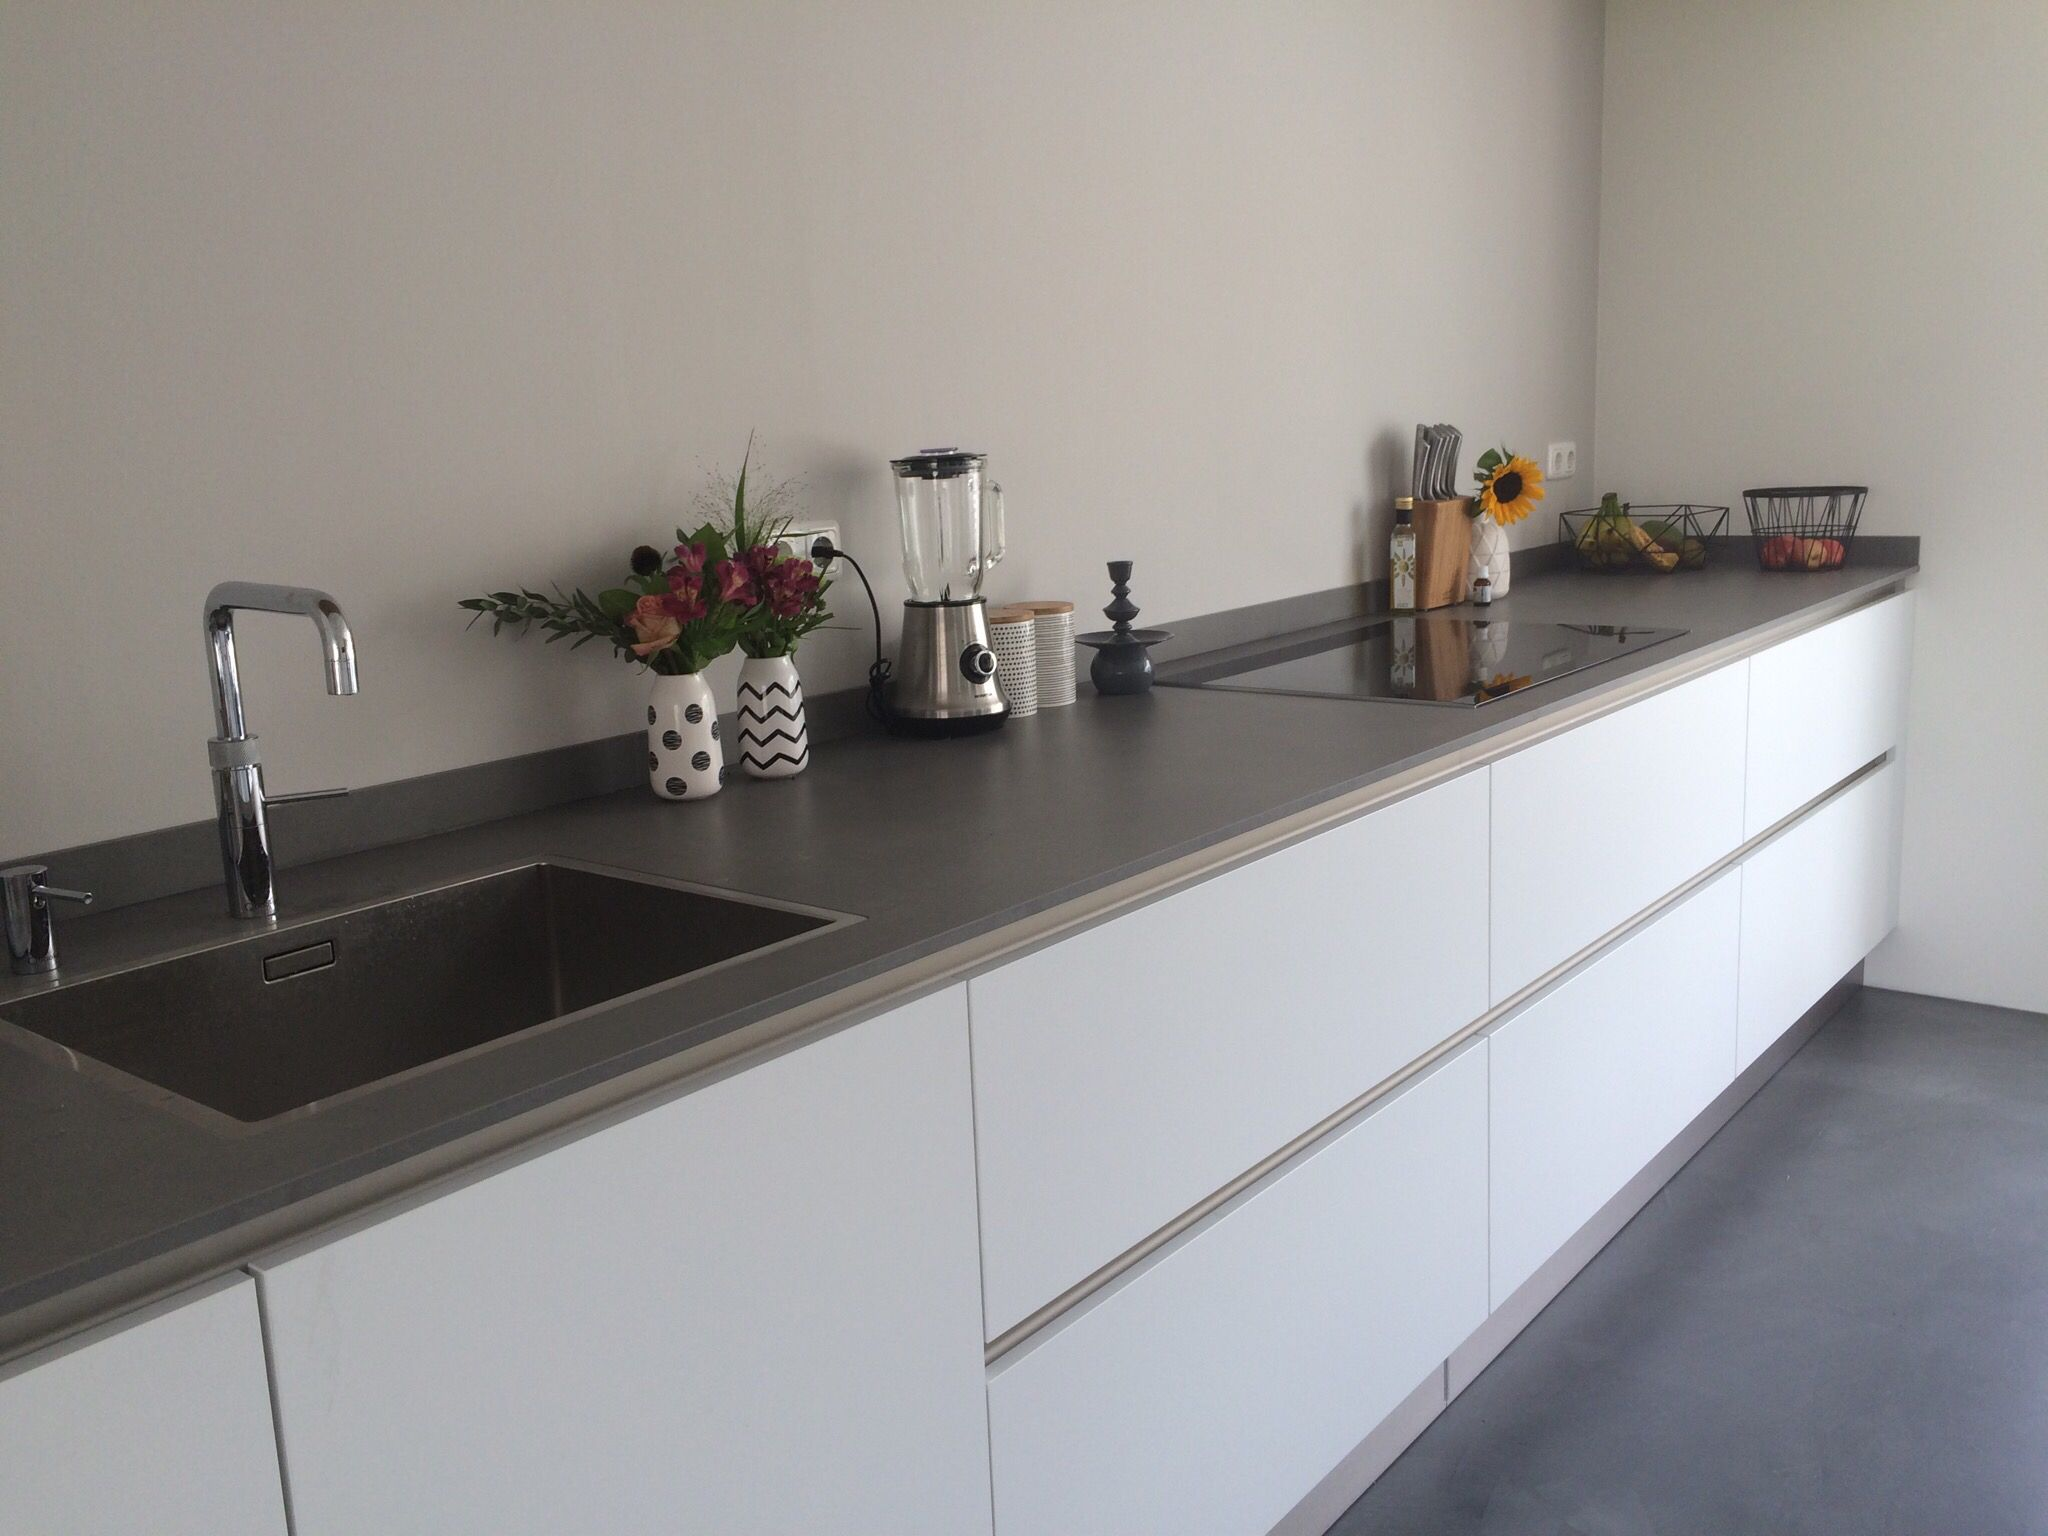 Moderne keuken strakke keuken witte keuken blad is betonlook dun